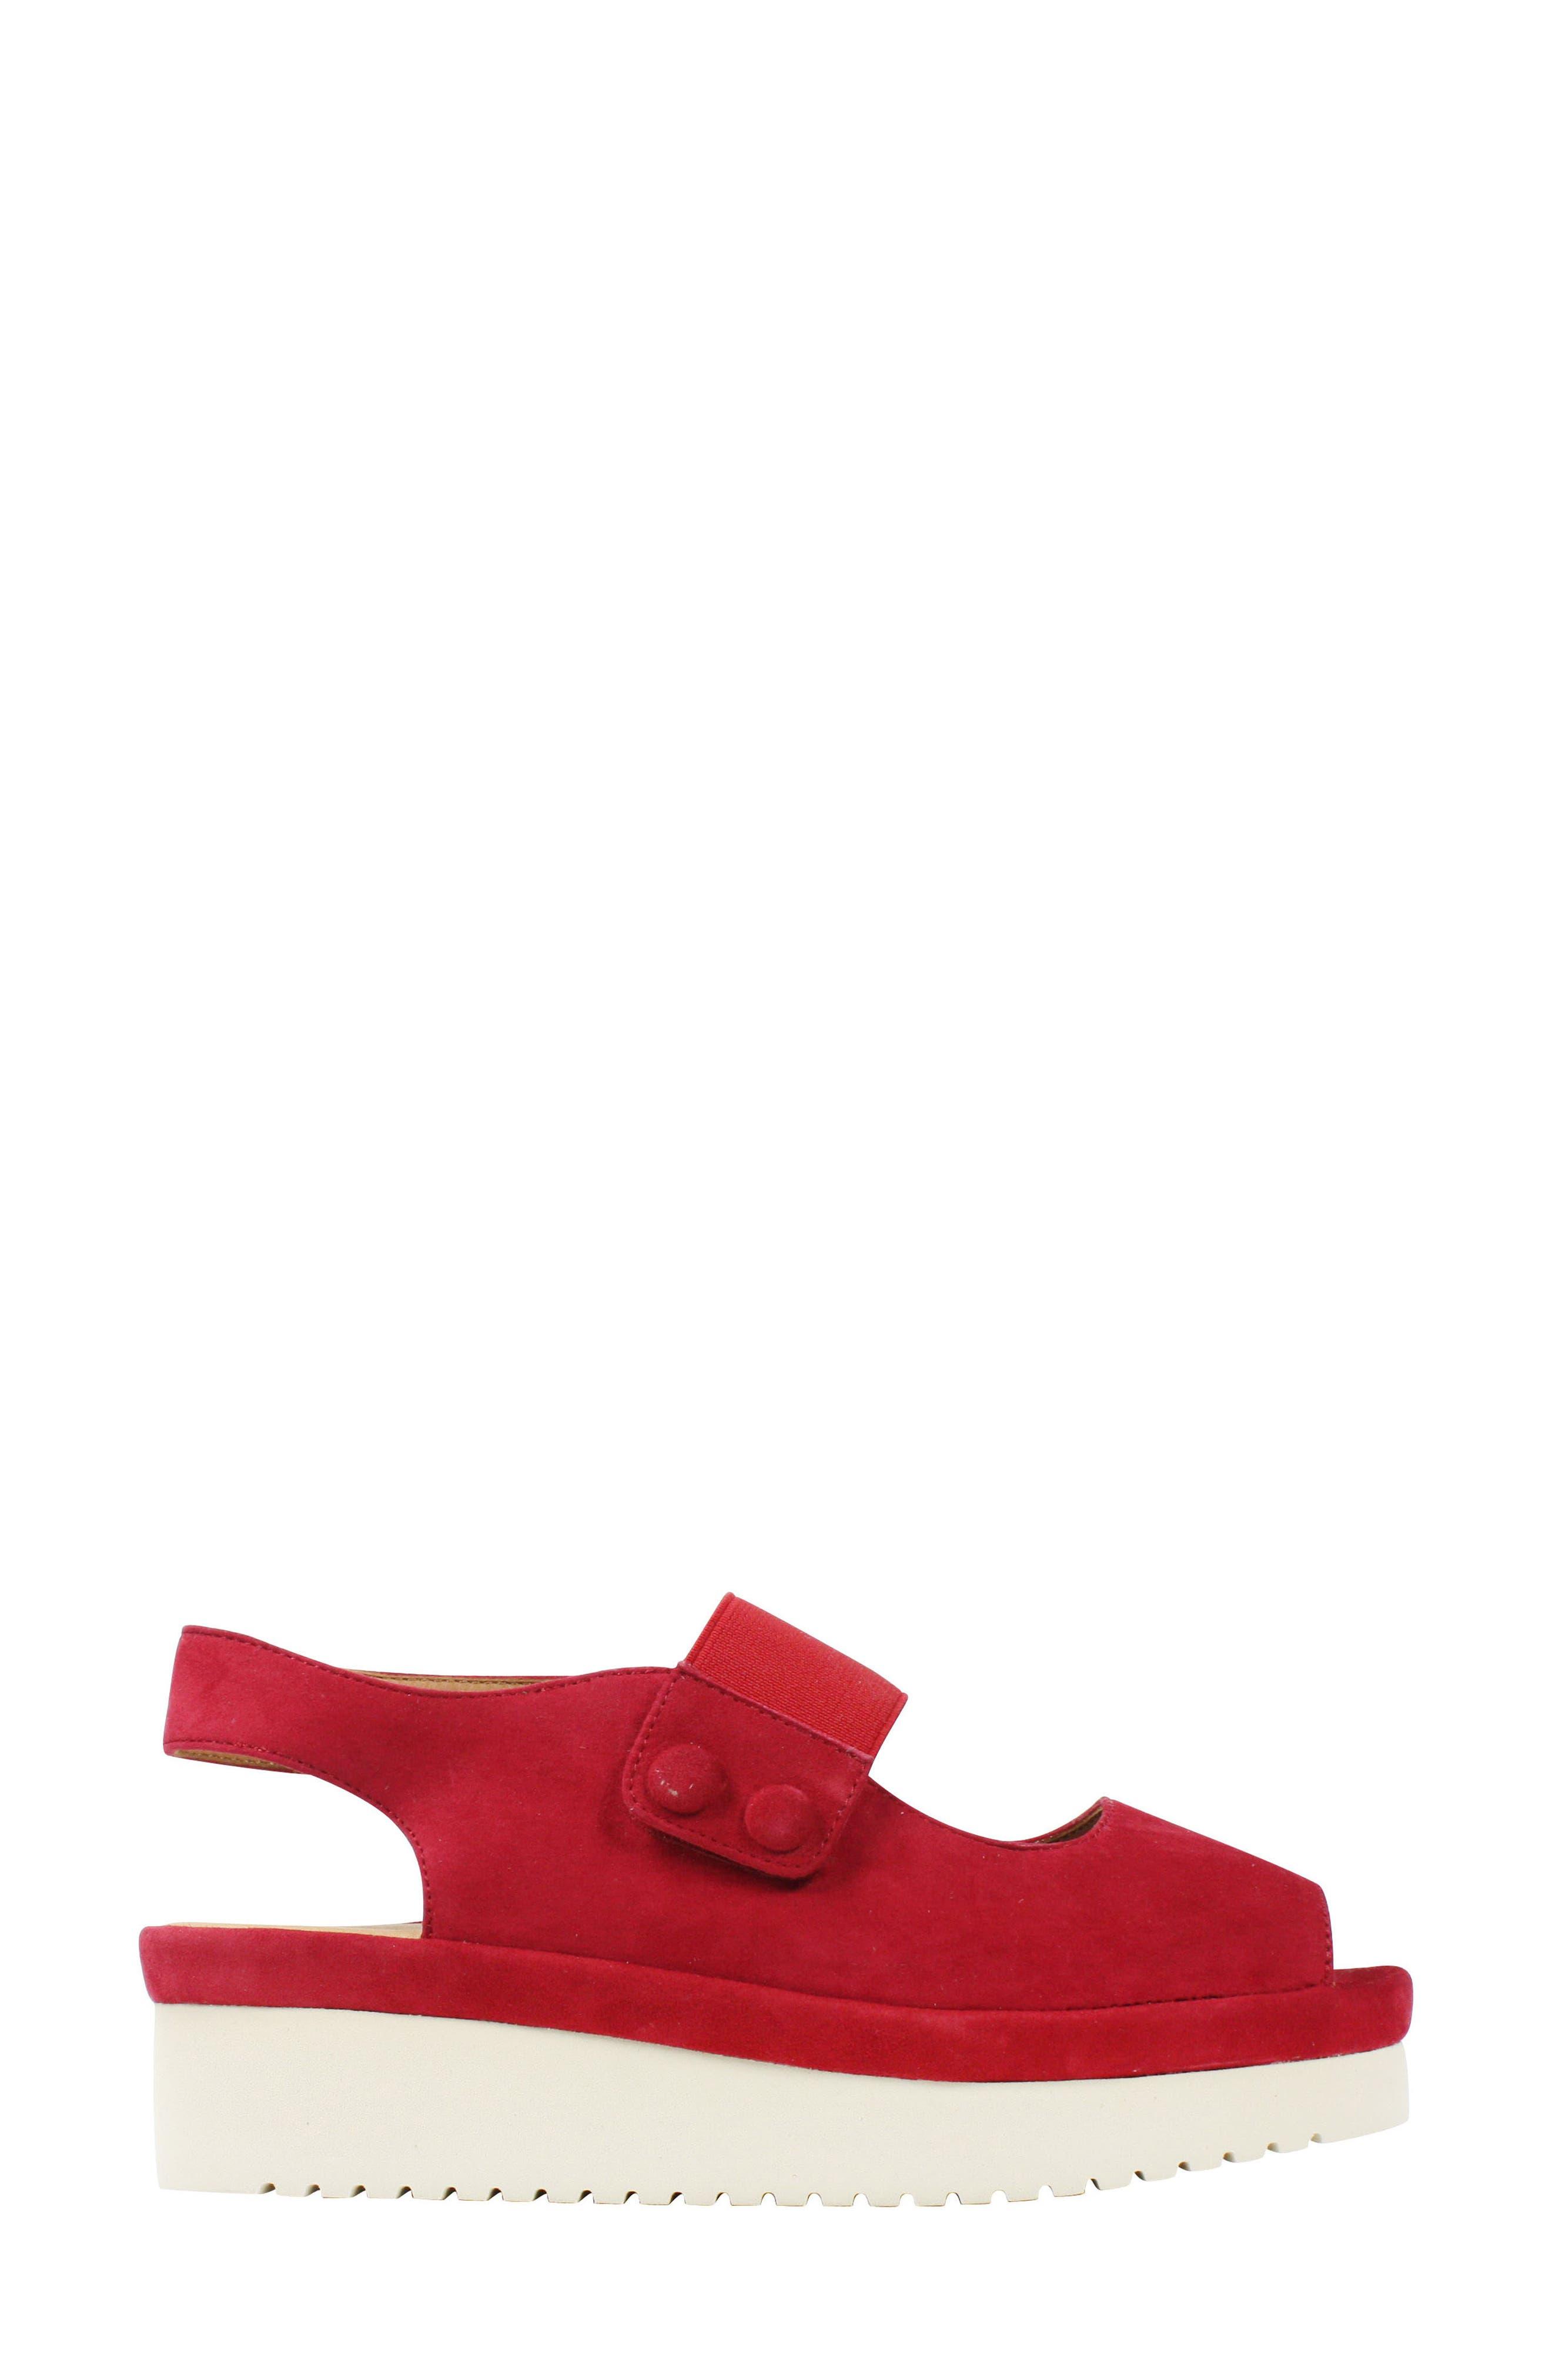 Adalicia Platform Sandal,                             Alternate thumbnail 3, color,                             Bright Red Suede